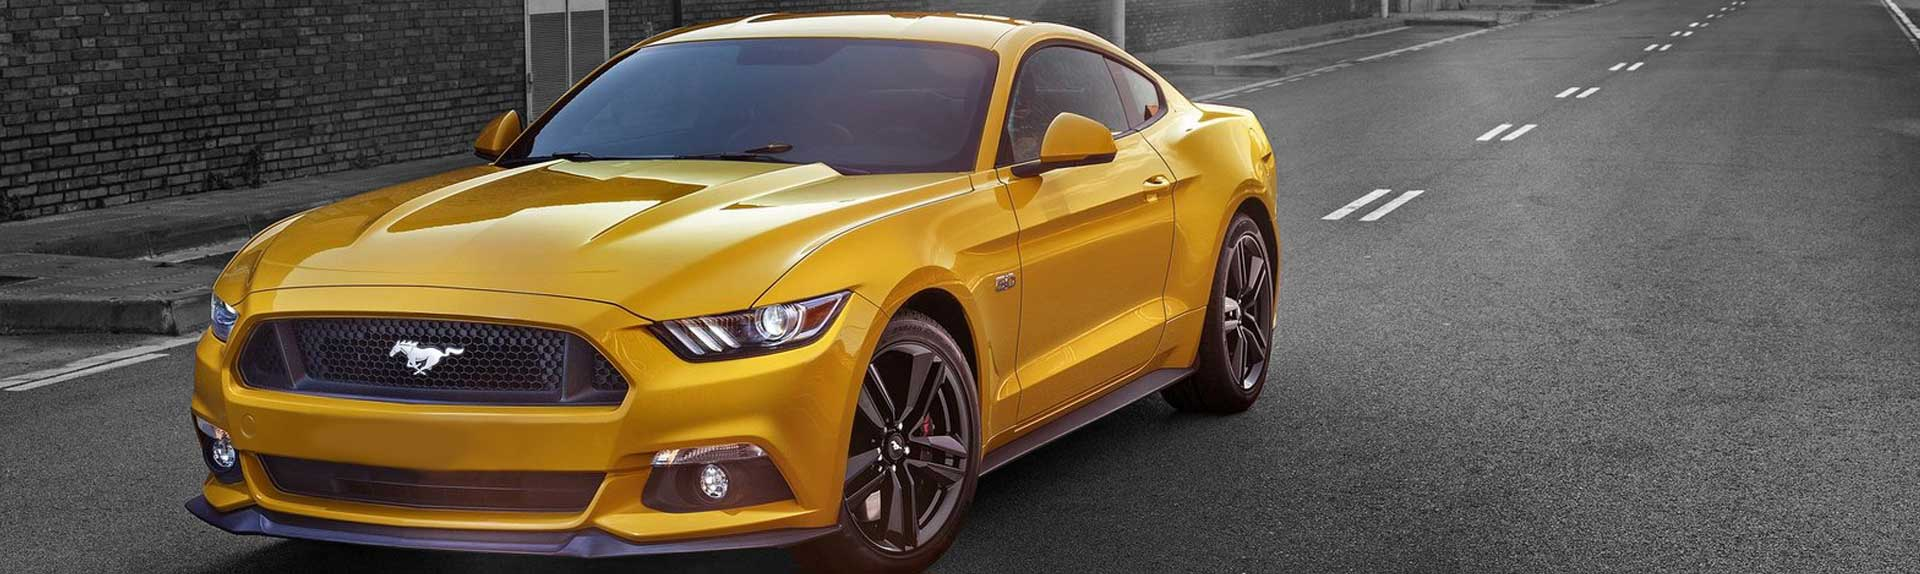 Rollit Motors – Car Dealer in Mesa, AZ